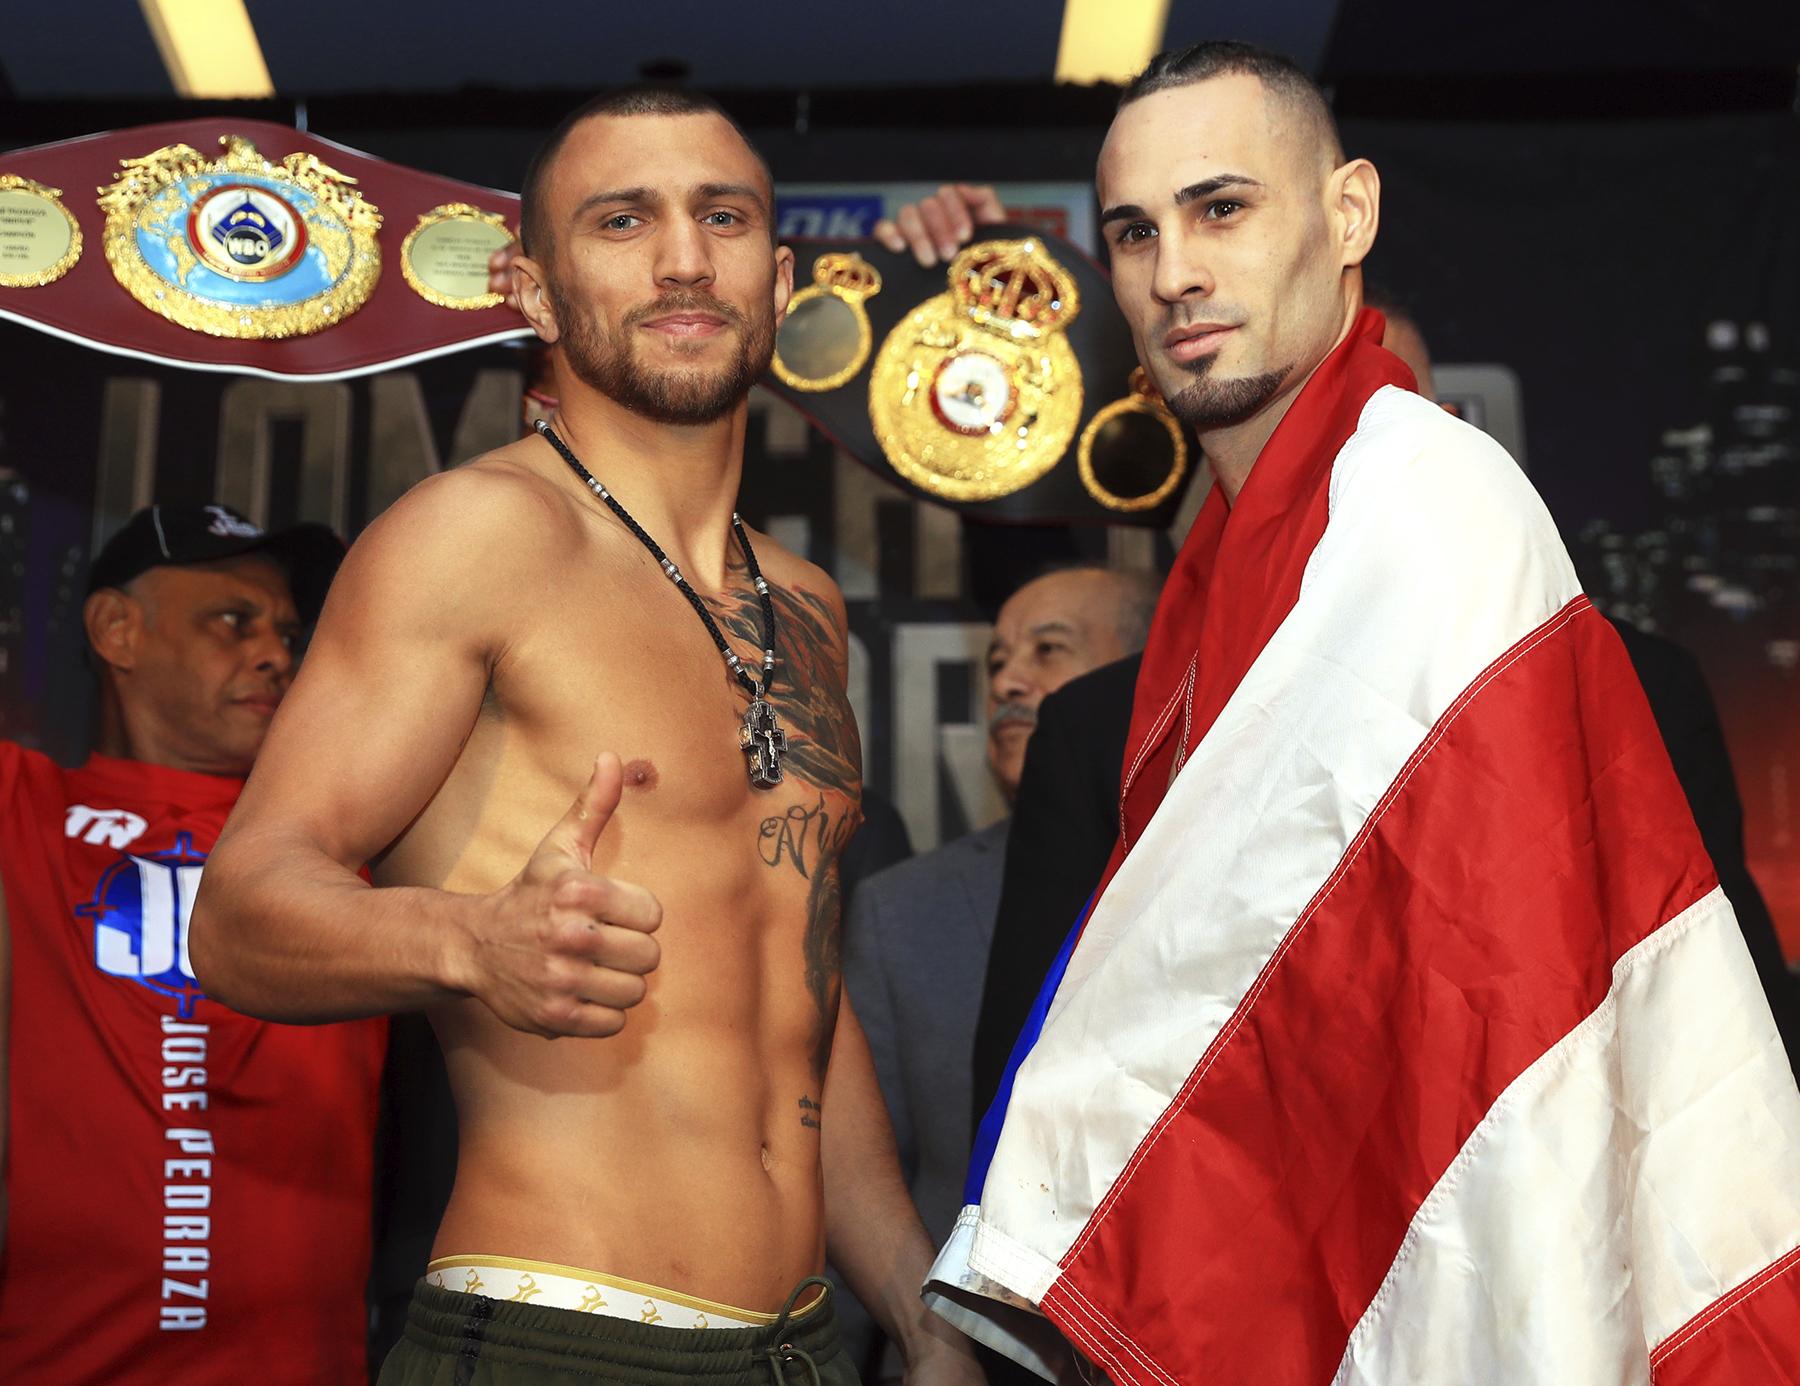 The Ring Magazine/WBA/WBO lightweight champion Vasiliy Lomachenko (left) and Jose Pedraza. Photo by Mikey Williams/Top Rank